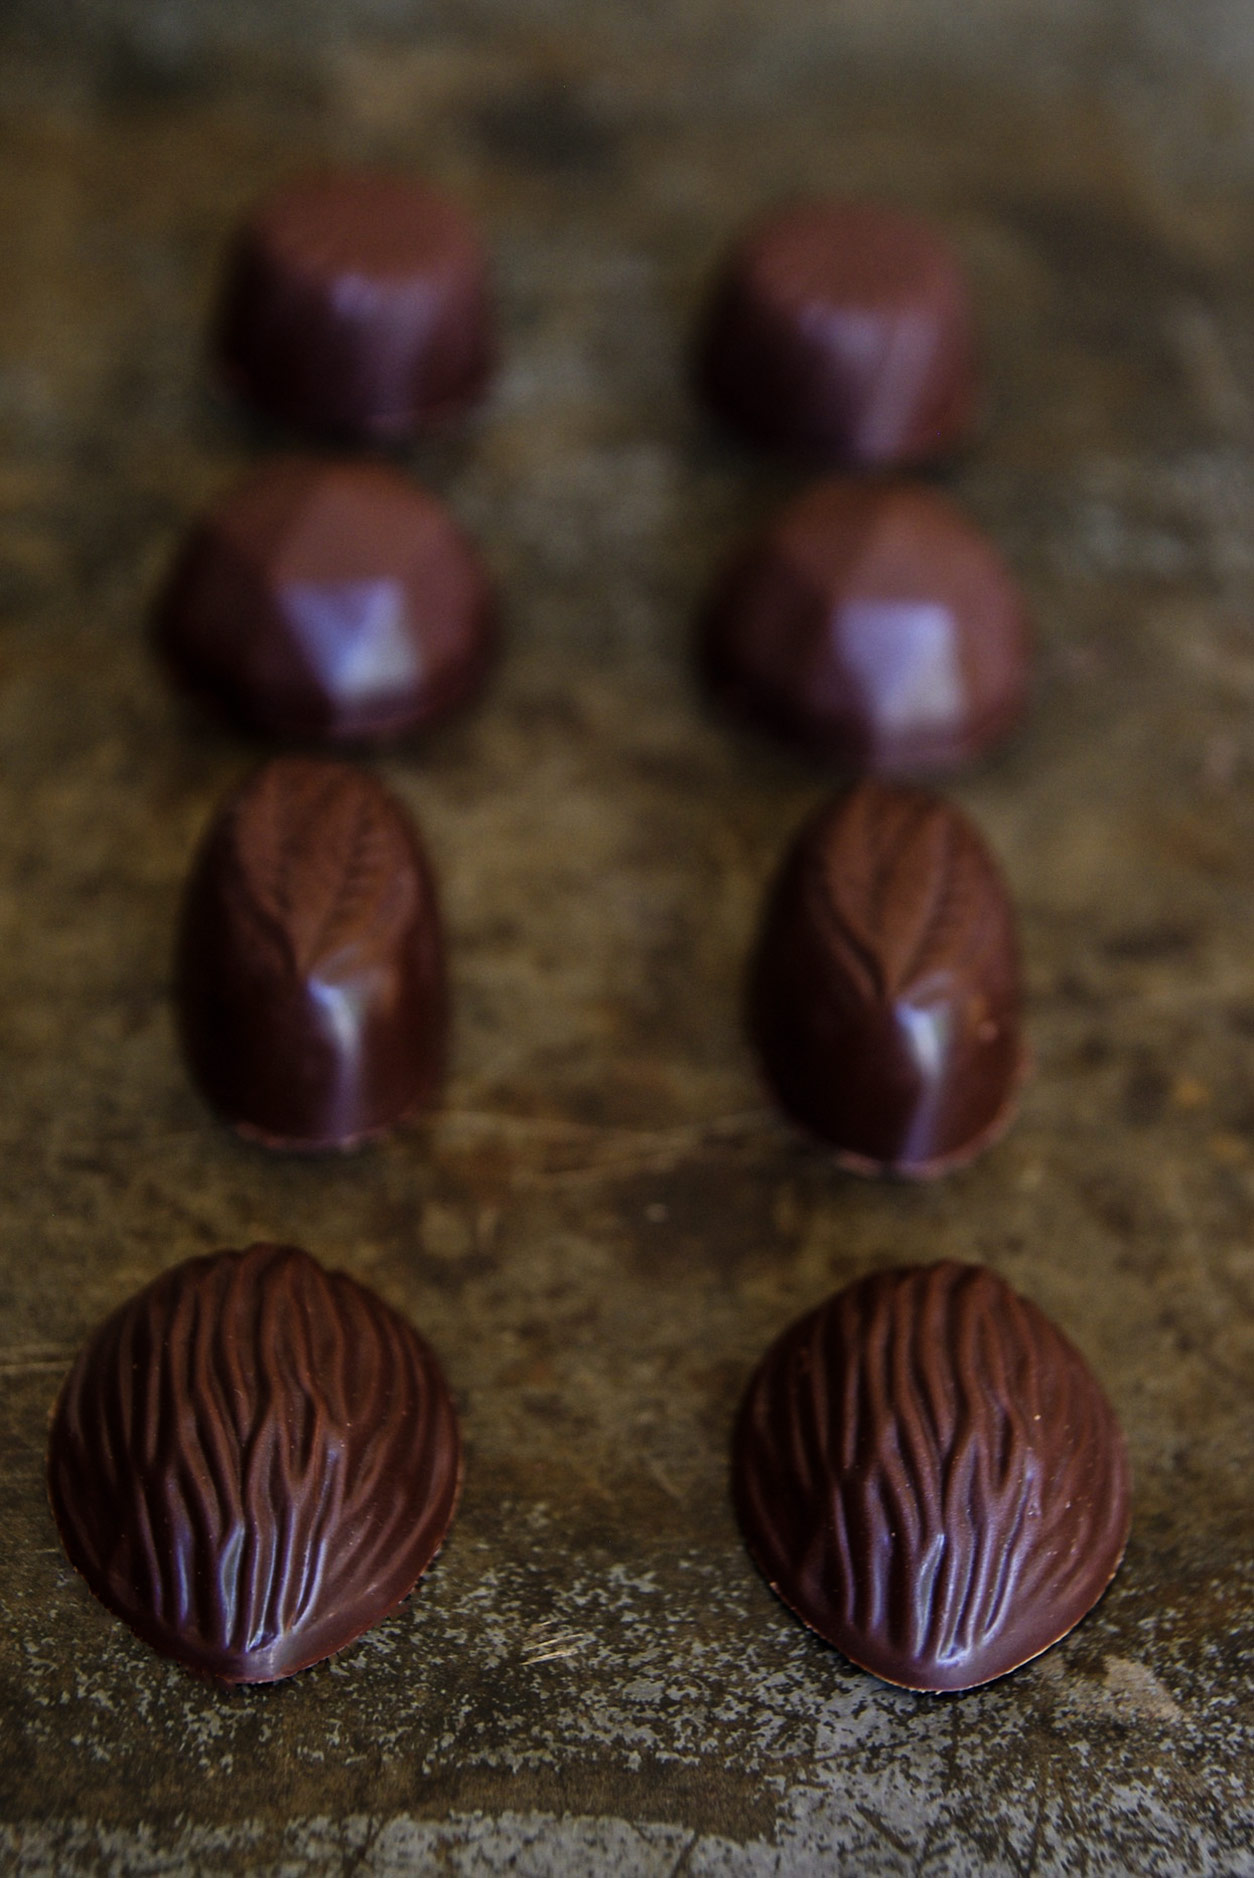 chocolat ; chocolate ; sweet ; valrhona ; lindt , caramel ; hazelnut ; praline; praliné ; good ; food ; dessert ; kosher ; pavers ; recipe ; blog ; blogger ; cook ; chef ; cooking ;crunchy ; cacher ; bonbon ; bonbons , bombons ; yummy ; veggie ; healthy ;